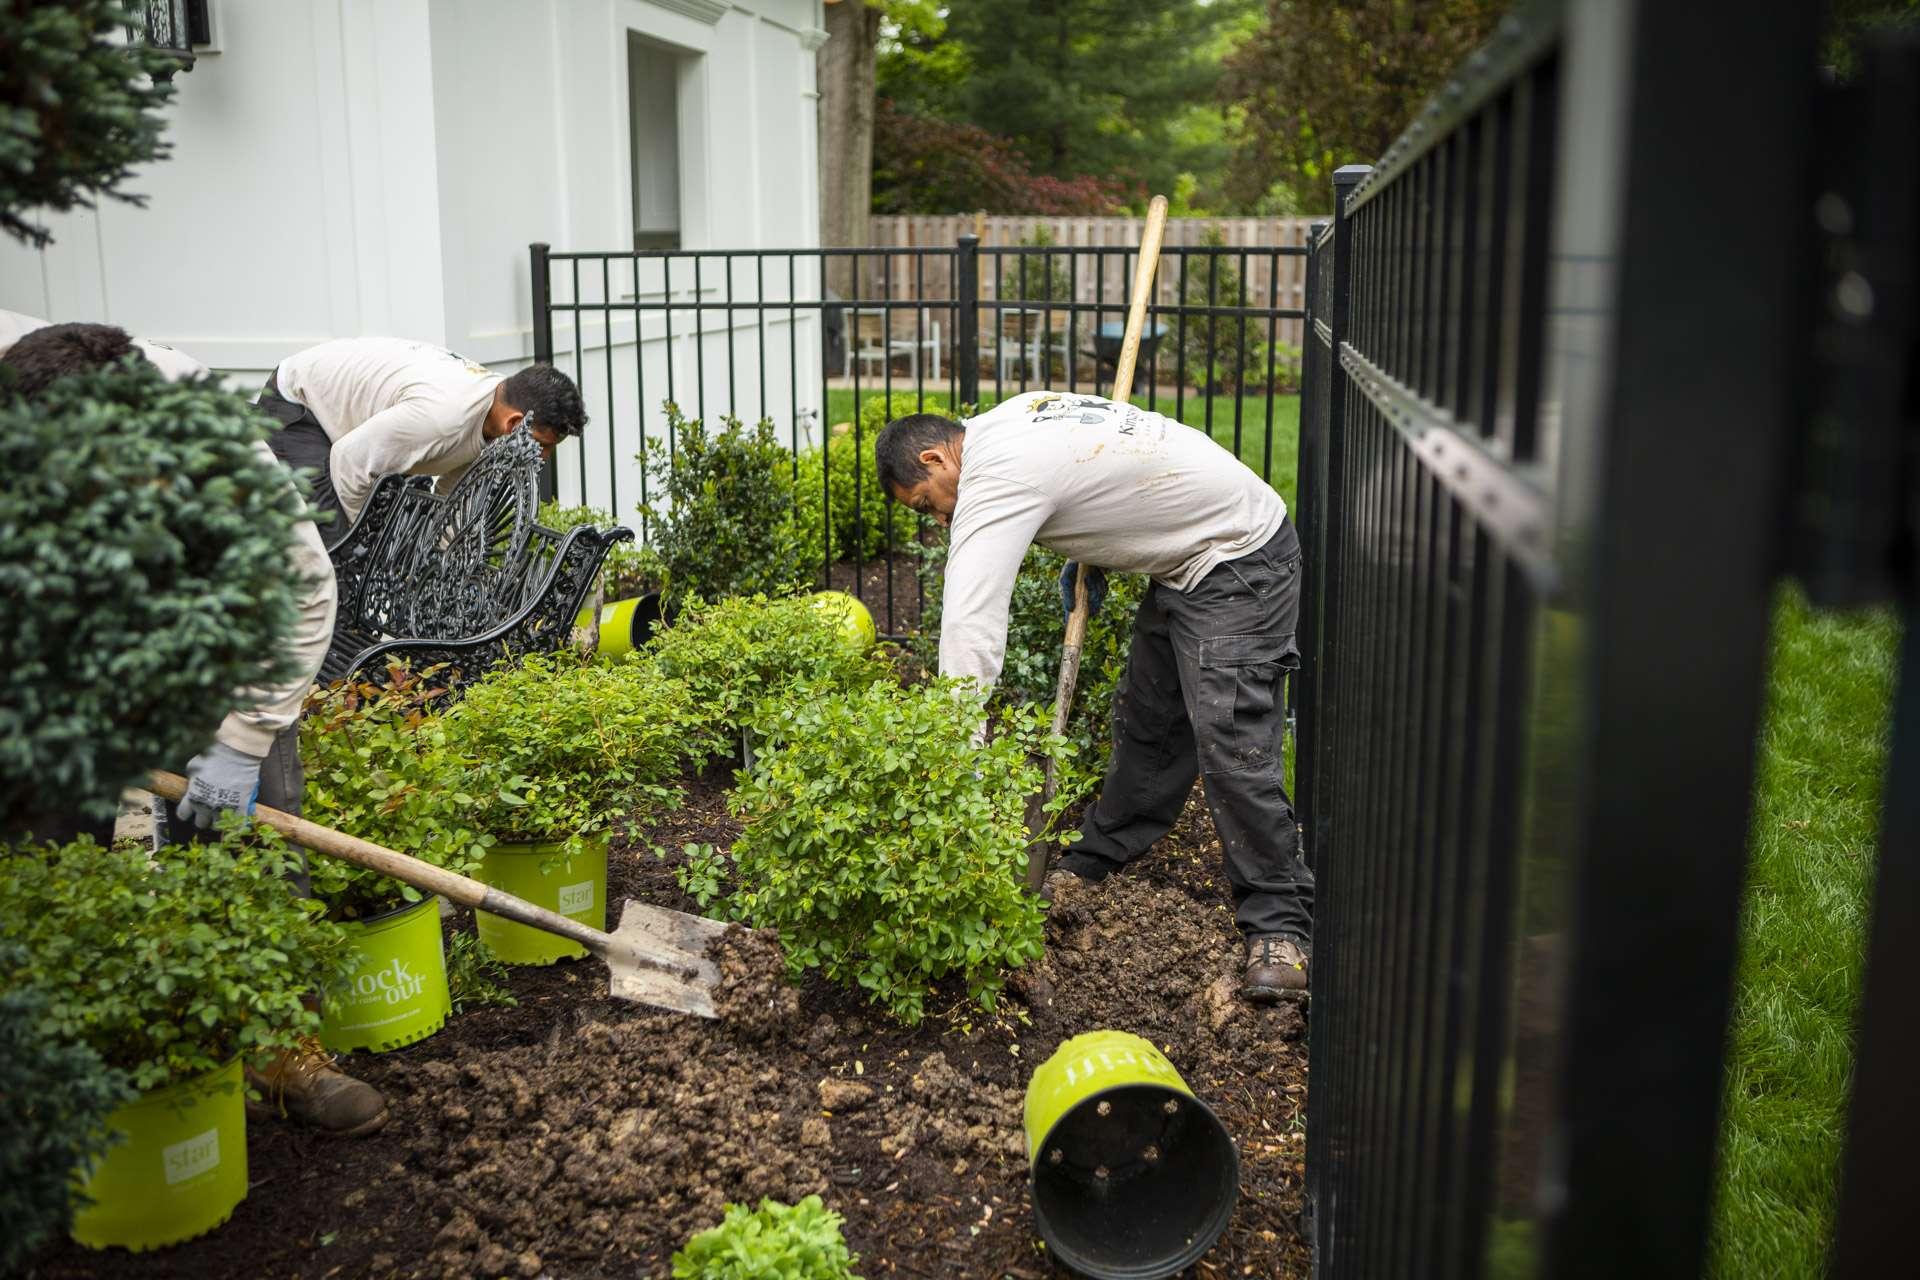 Landscape professionals installing new plants in summer months